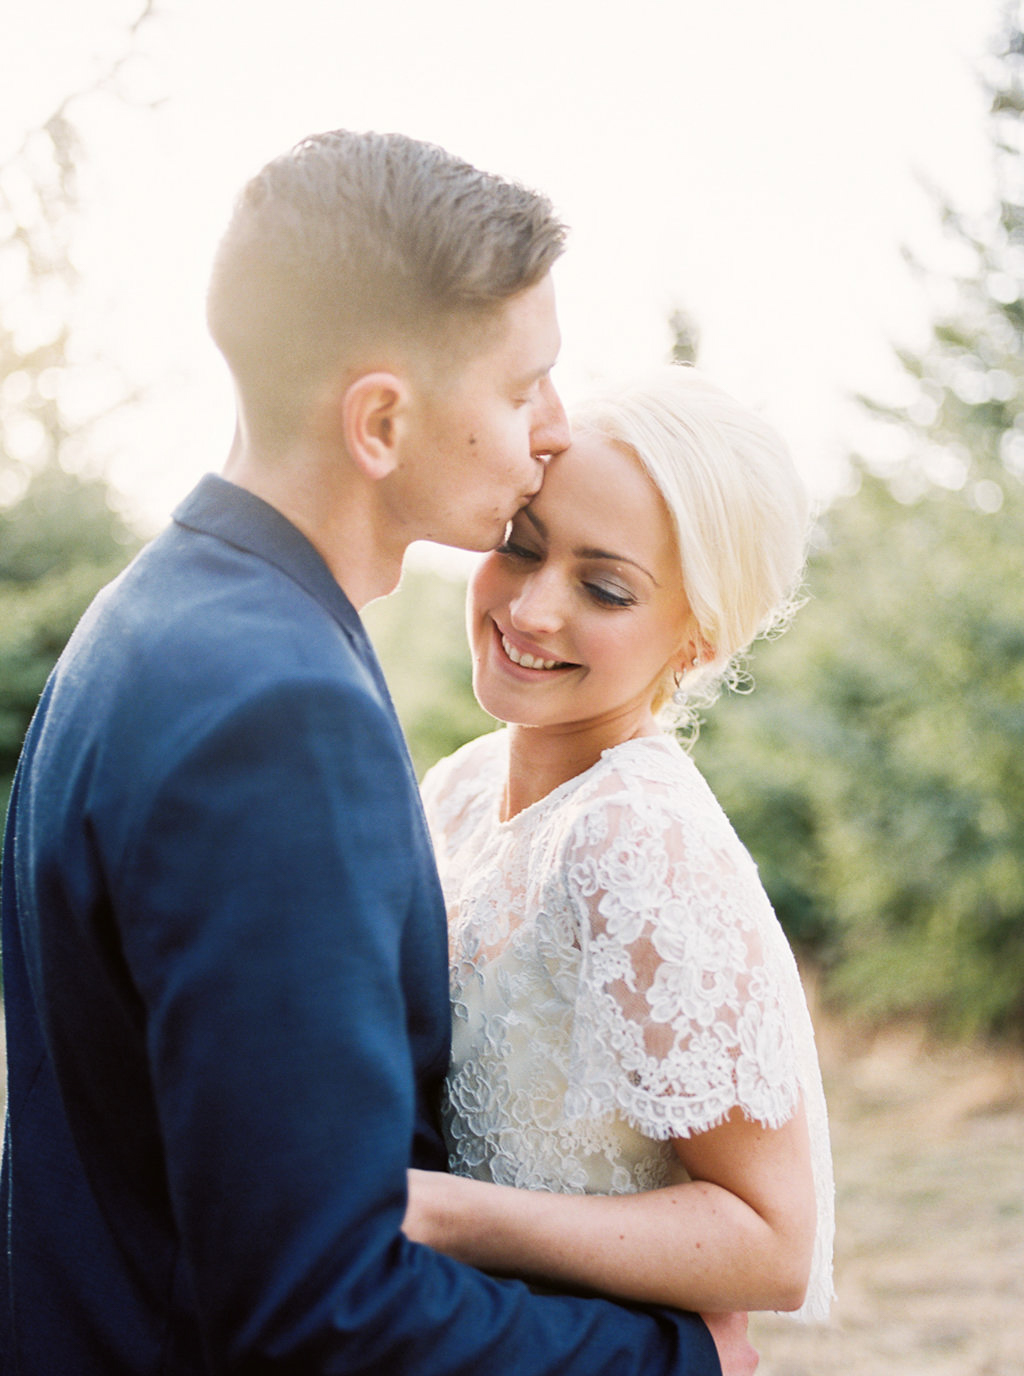 kayla-yestal-photography-vineyard-bride-swish-list-beamer-falls-manor-grimsby-engagement-13.jpg